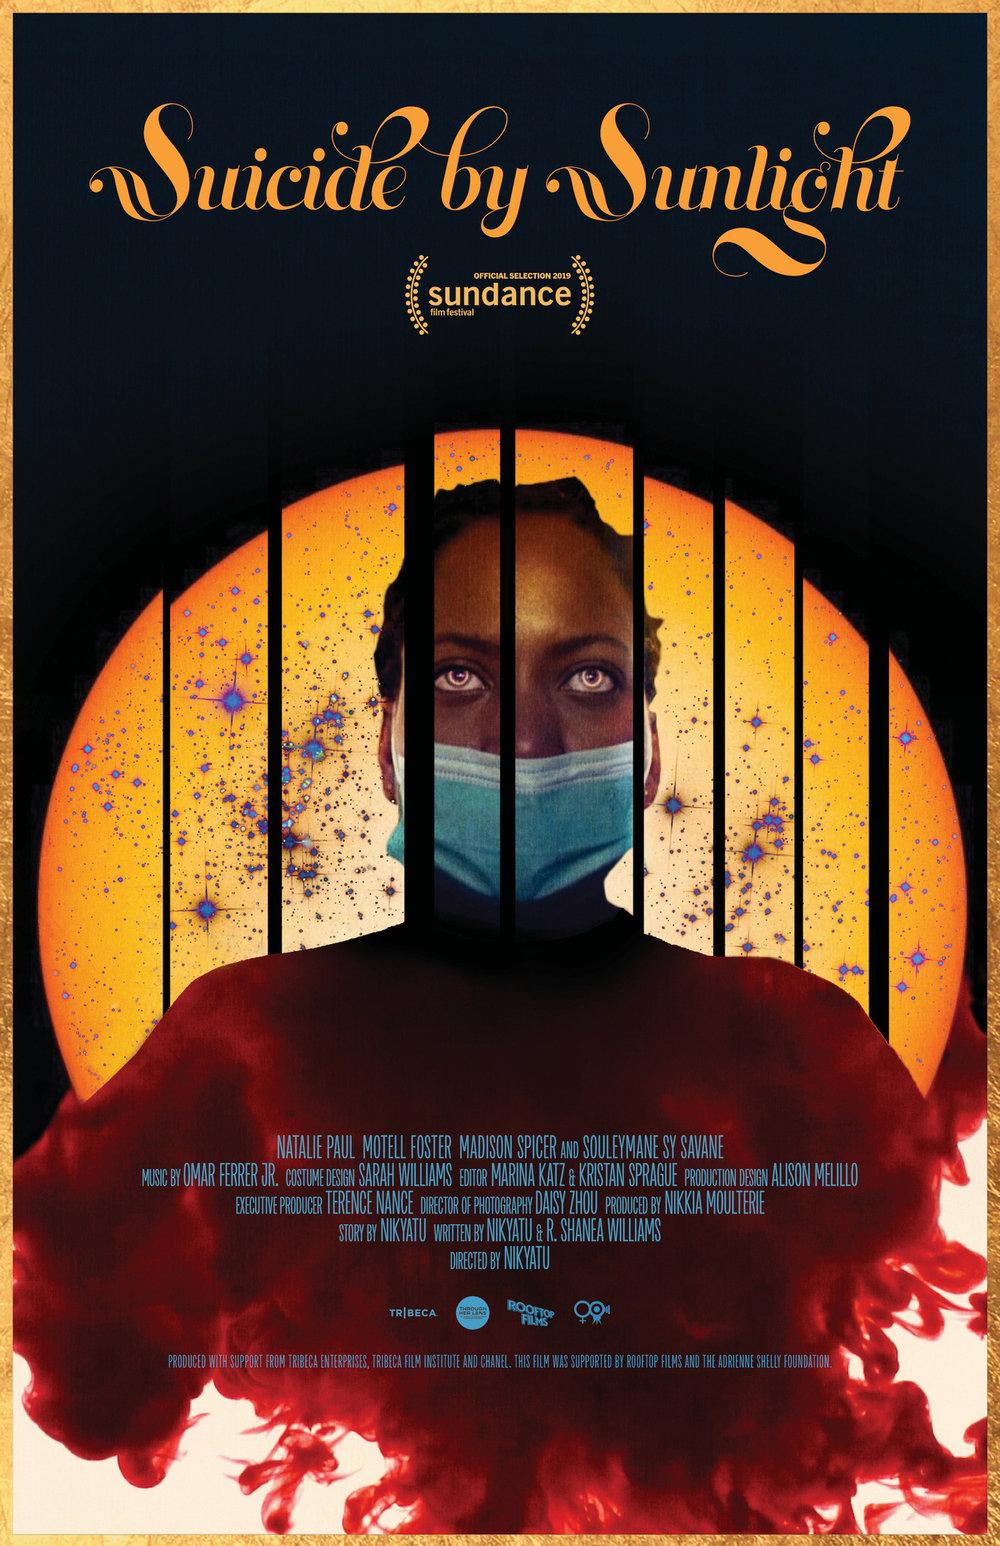 Martina Katz - Editor   October/November 2014 Class   2019 Sundance Film Festival